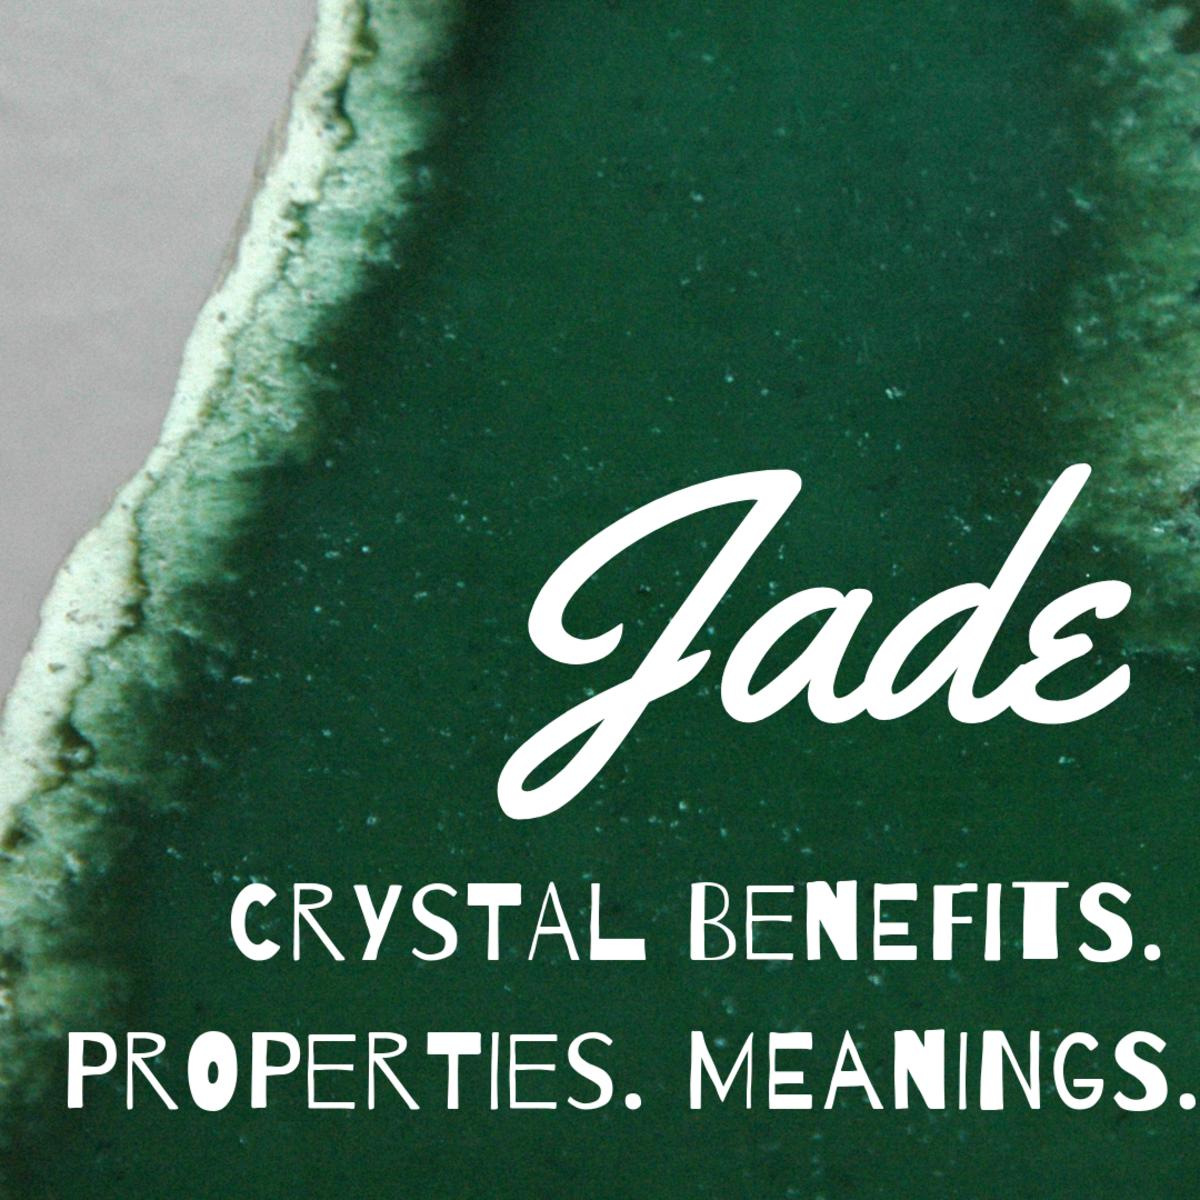 Jade stone properties.